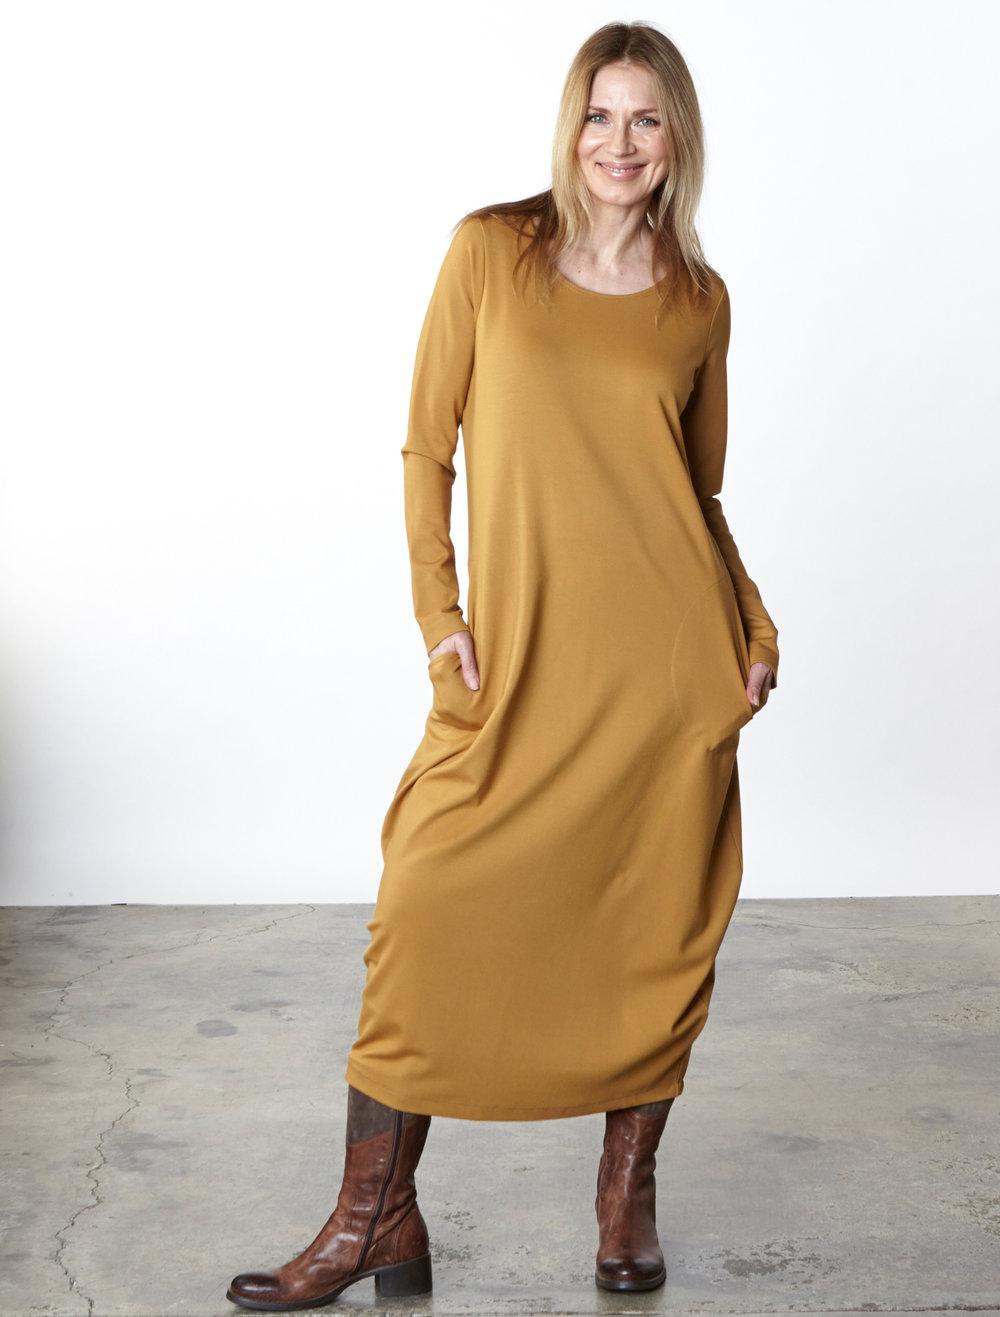 Philippa Dress in Camel Modal Ponti